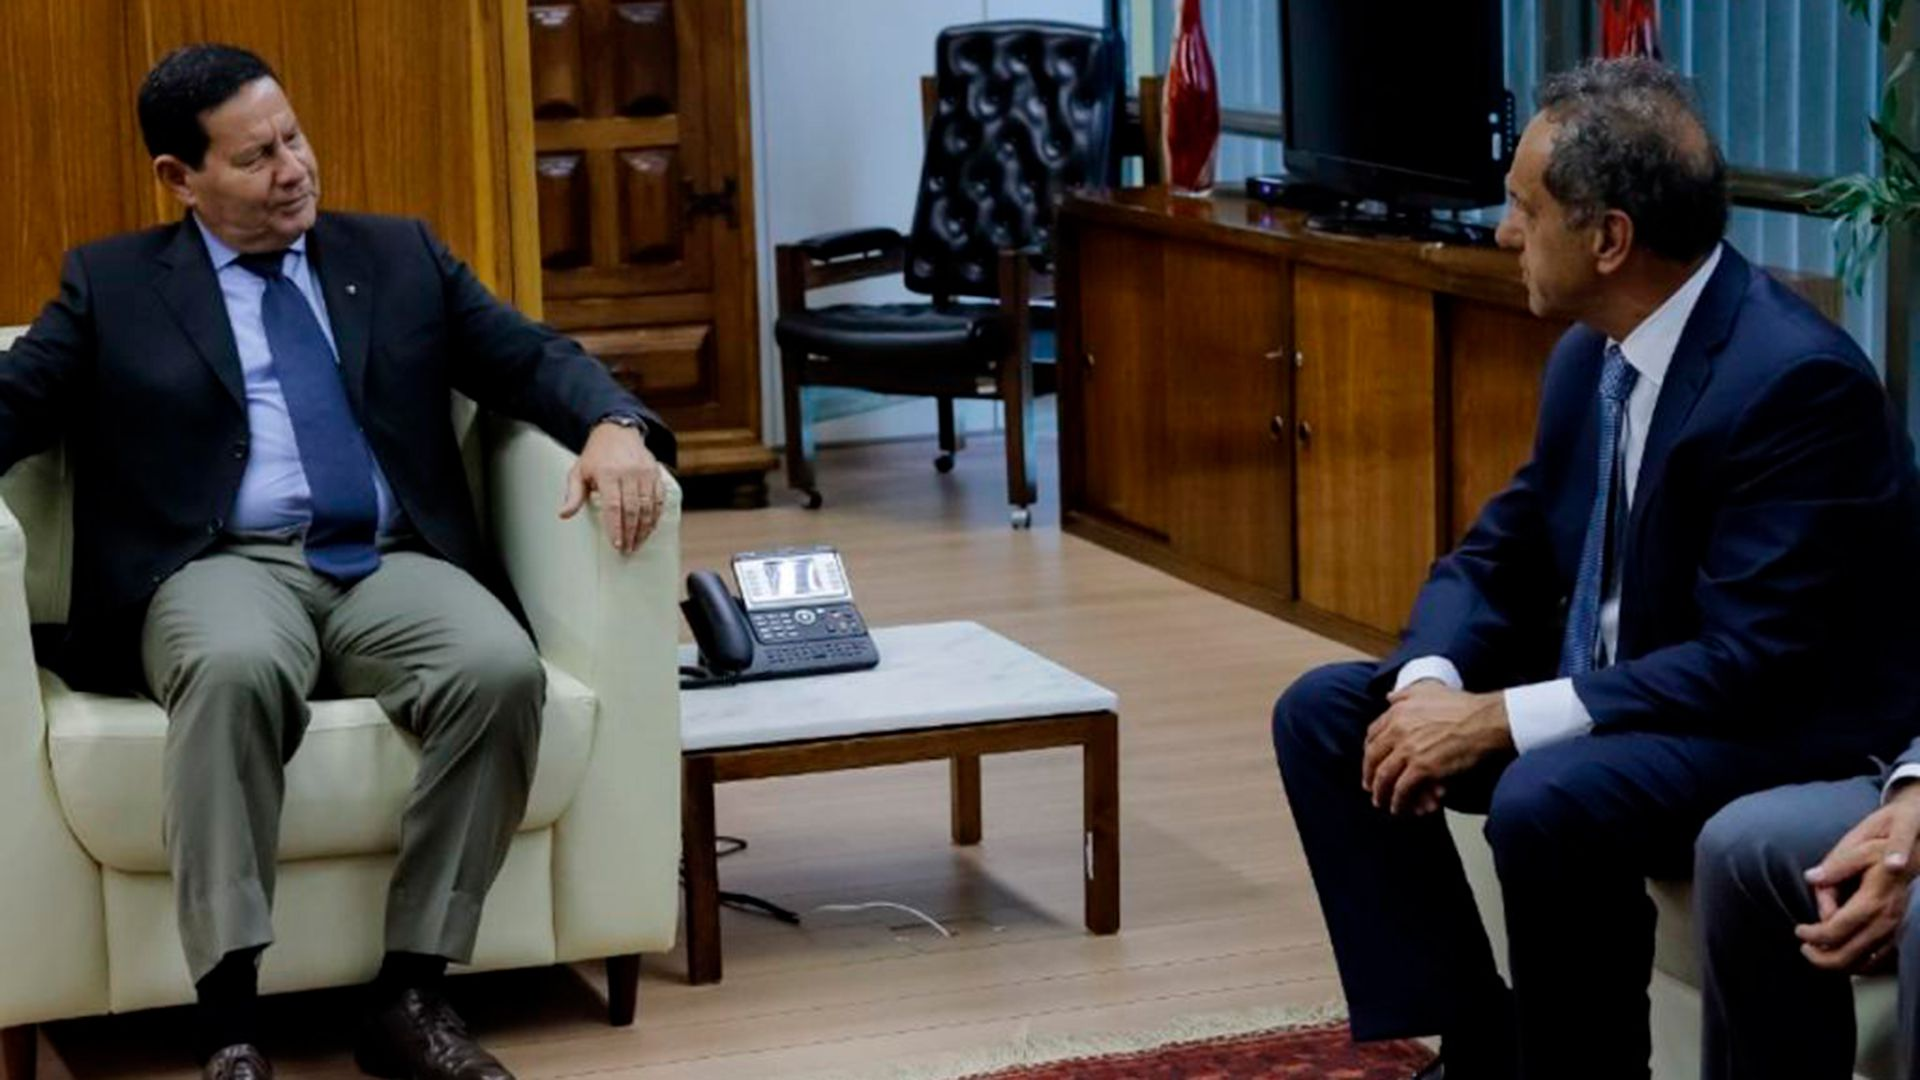 Daniel Scioli y Hamilton Mourao, vicepresidente brasileño